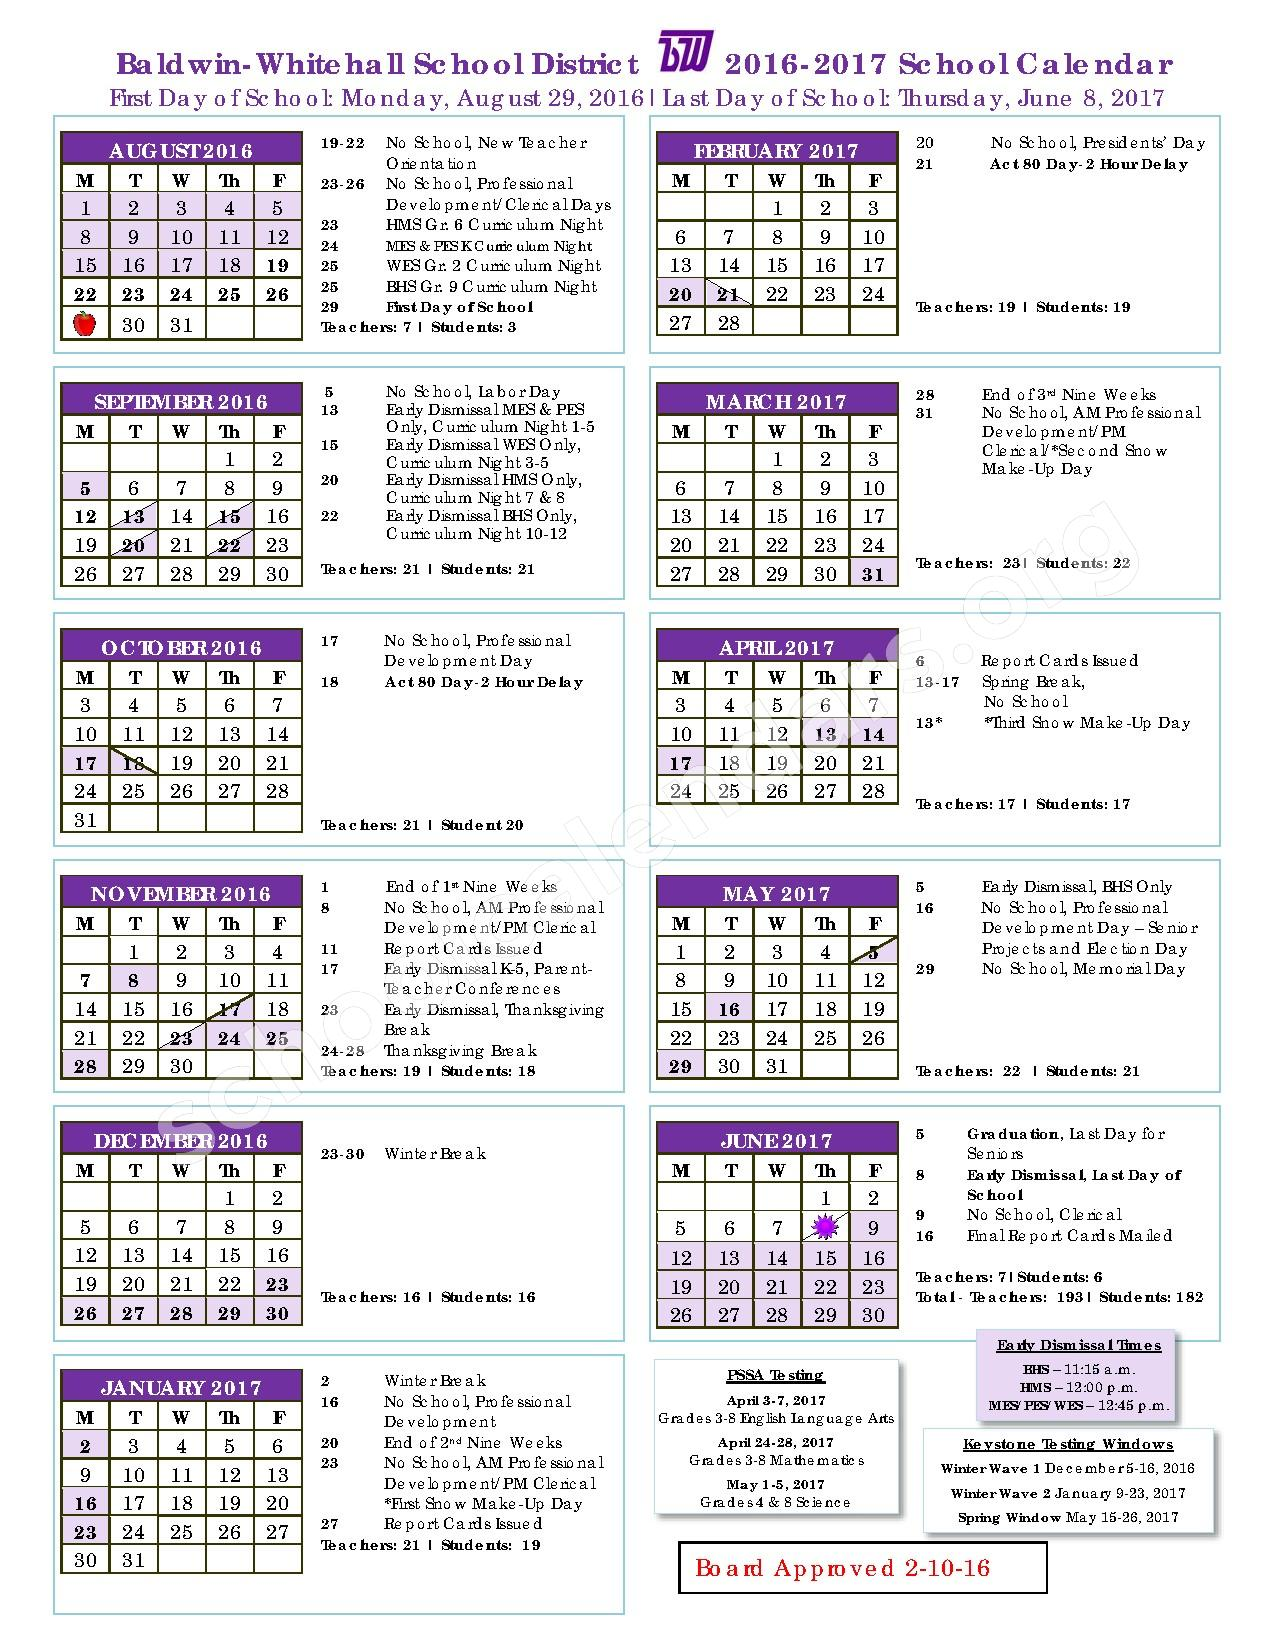 2016 - 2017 District Calendar – Baldwin-Whitehall School District – page 1